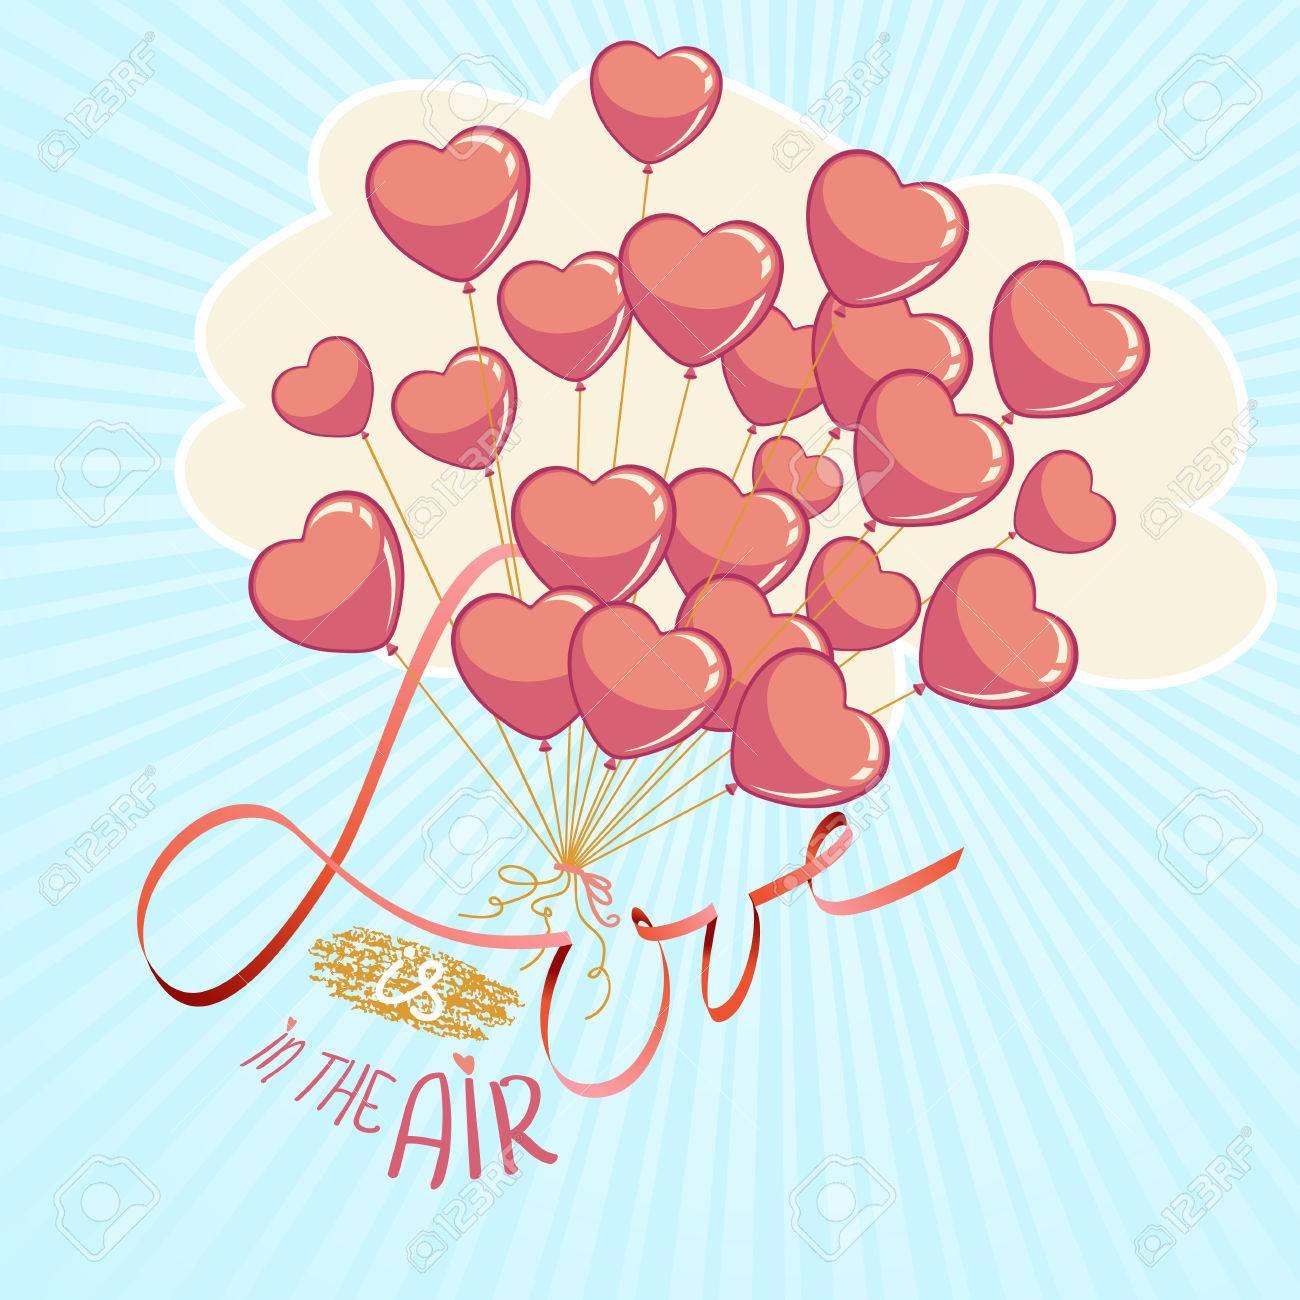 Dia De San Valentin O Ilustracion Vectorial Tarjeta De La Plantilla